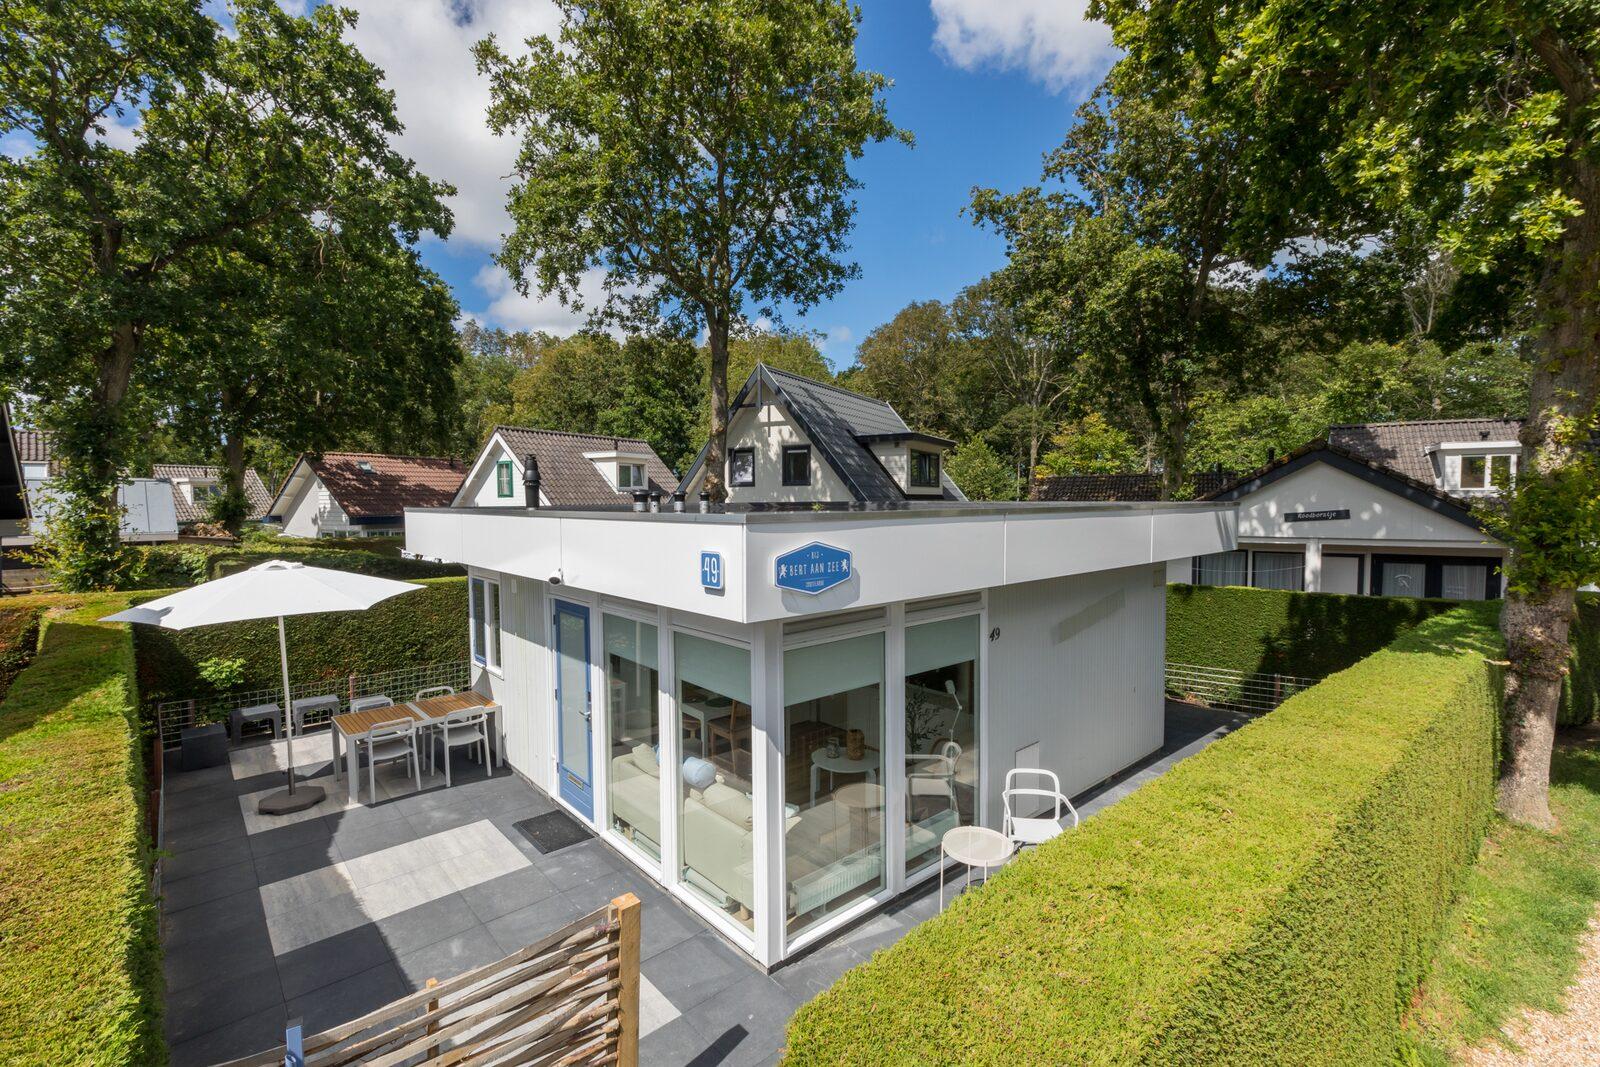 Holidayhouse - Noordendolfer 2-49 | Zoutelande